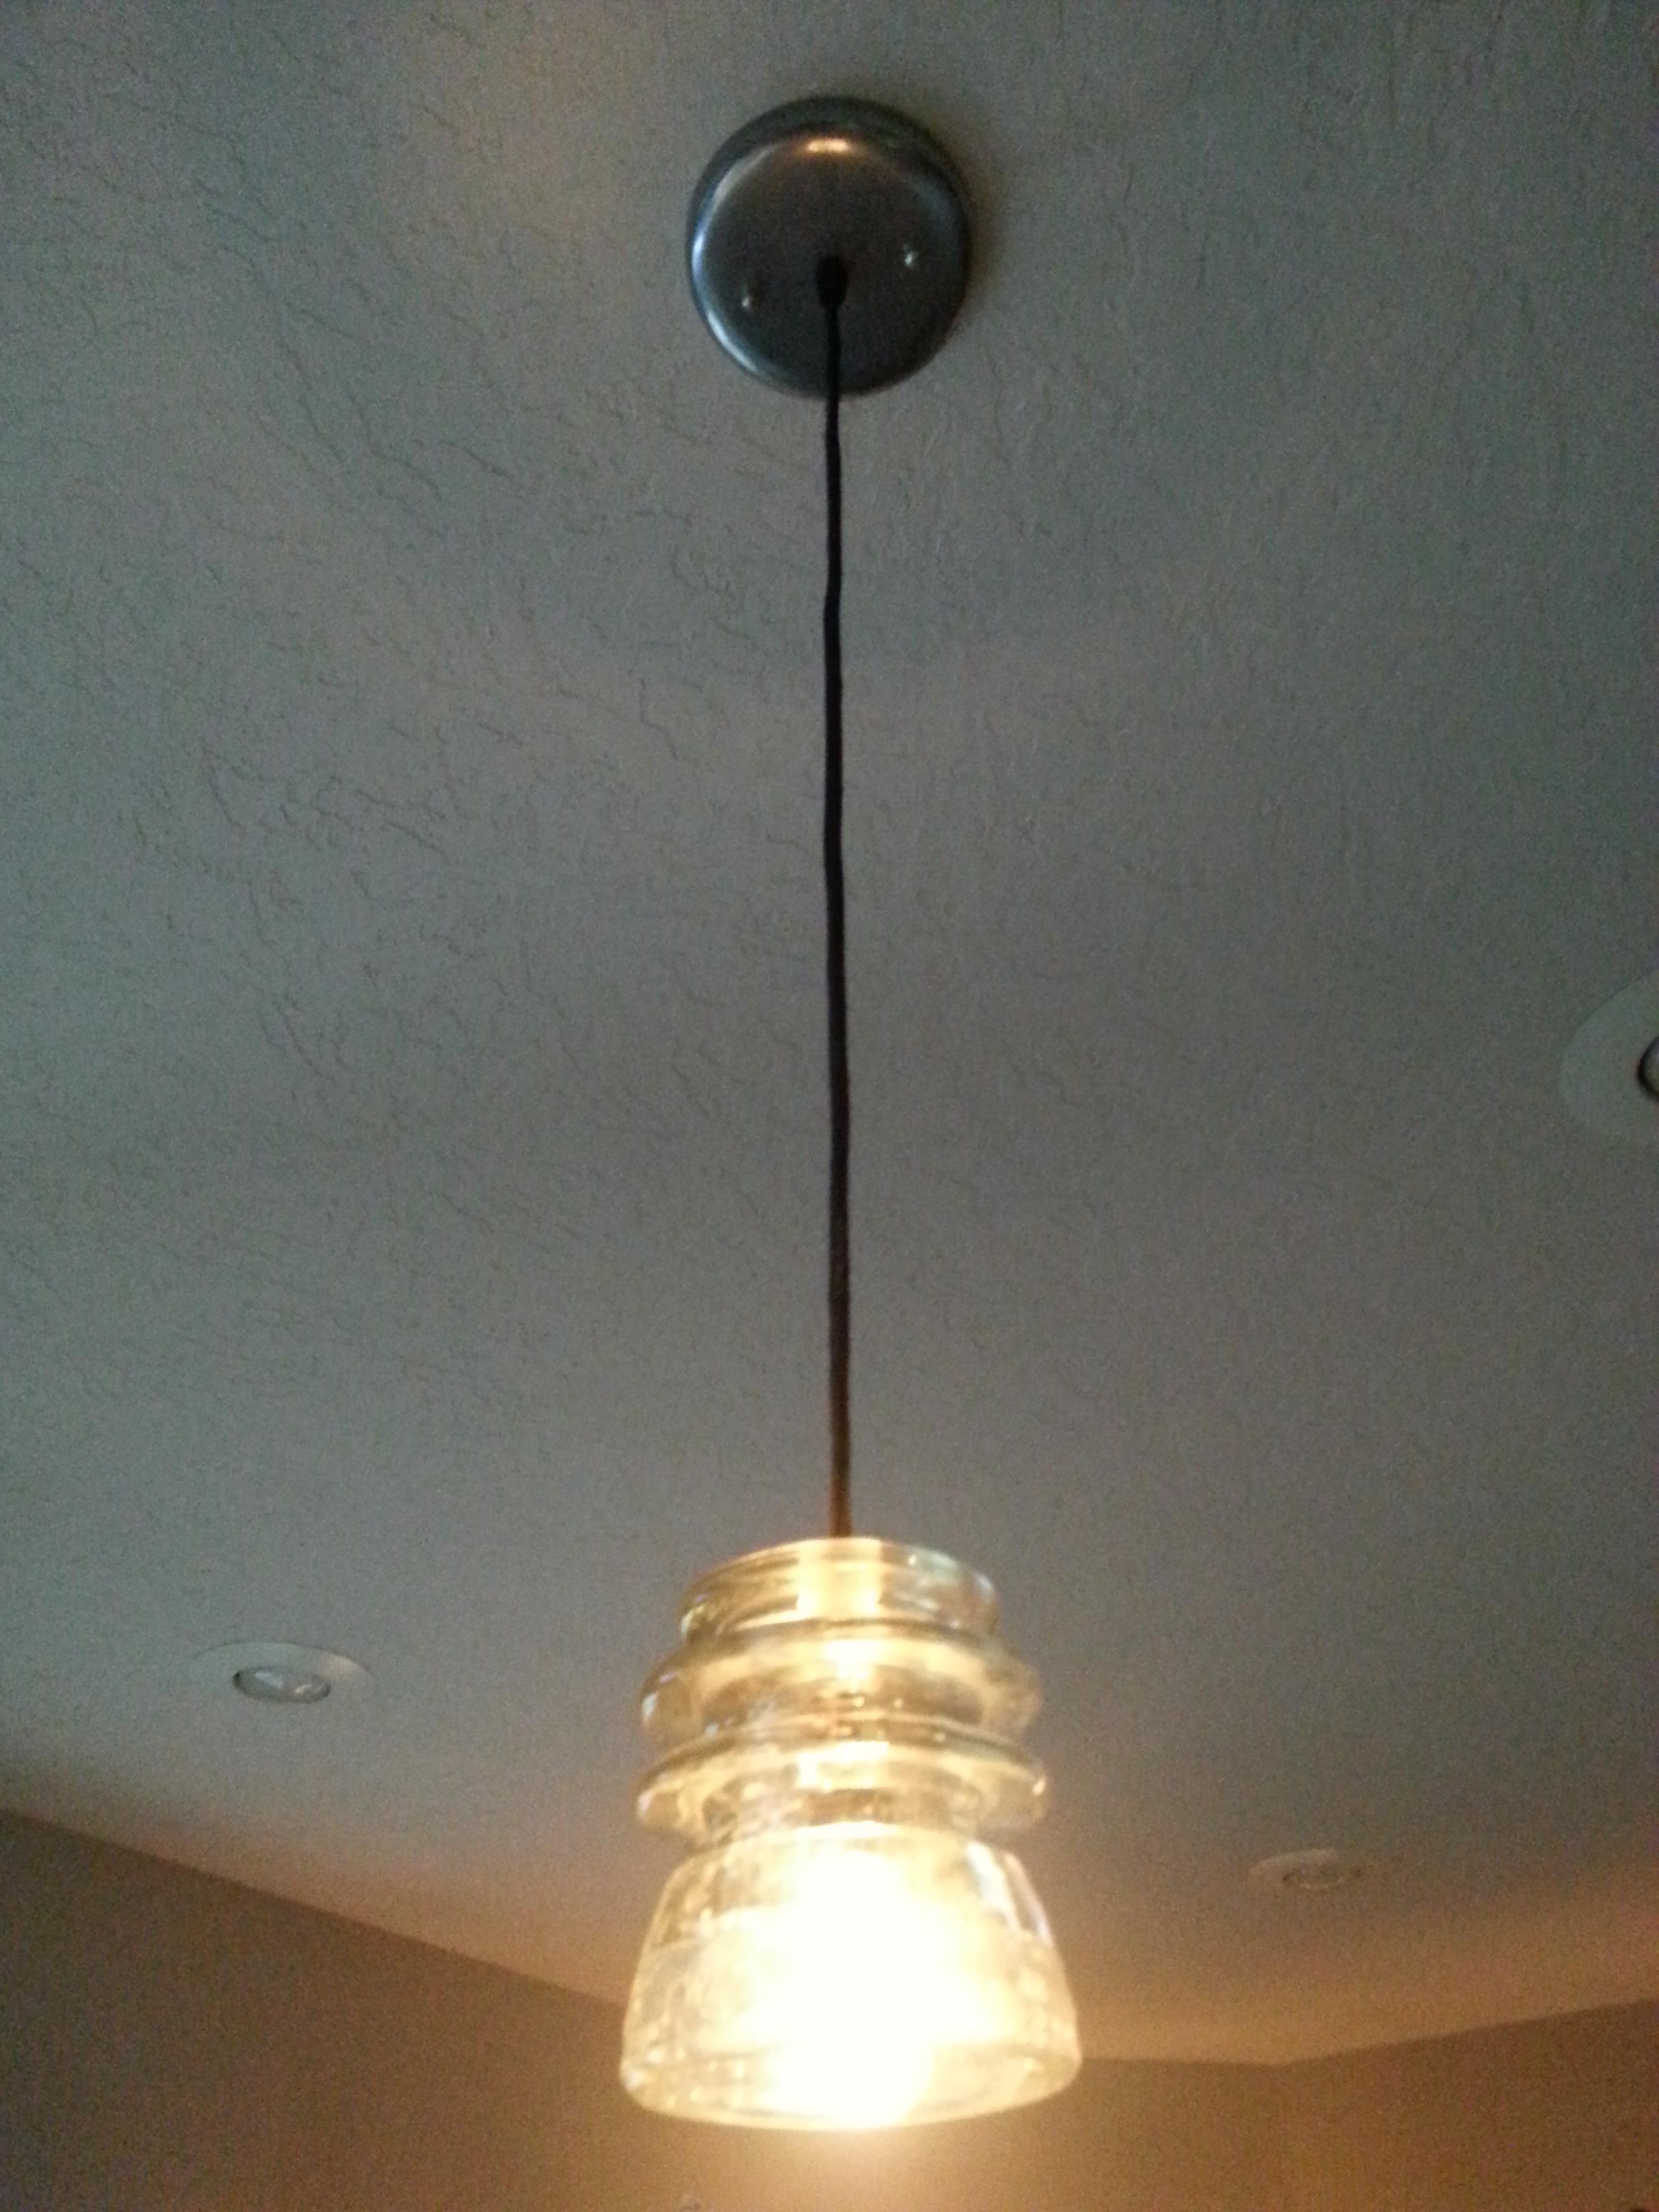 Vintage insulator pendant light recreated lighting for Antique insulator pendant lights